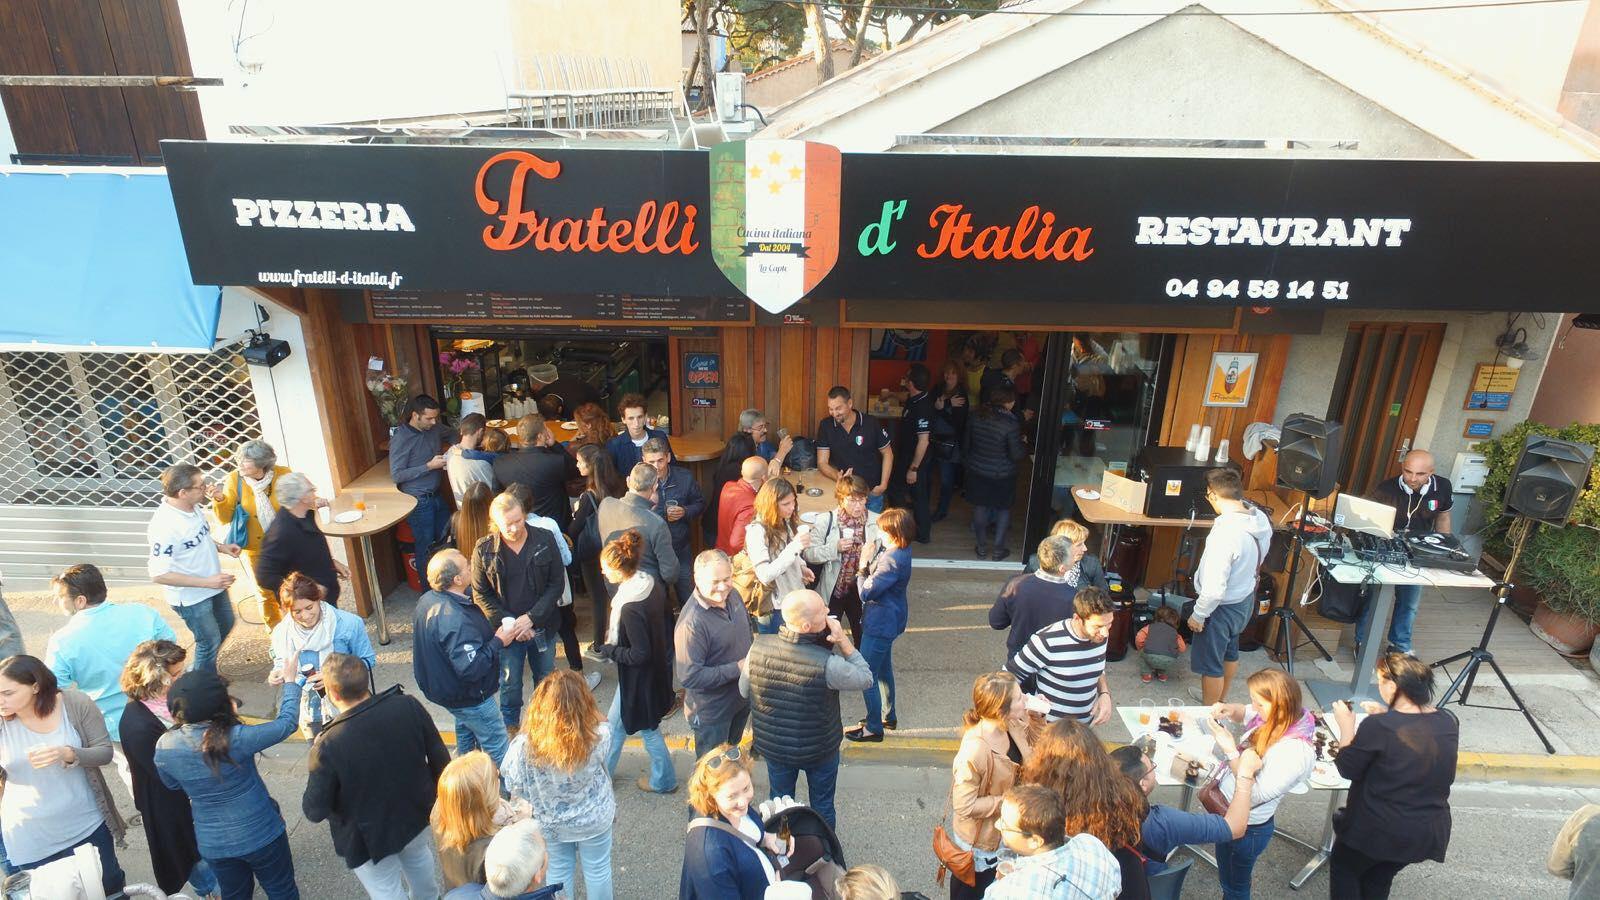 pizzeria Fratelli d'Italia La Capte Hyères